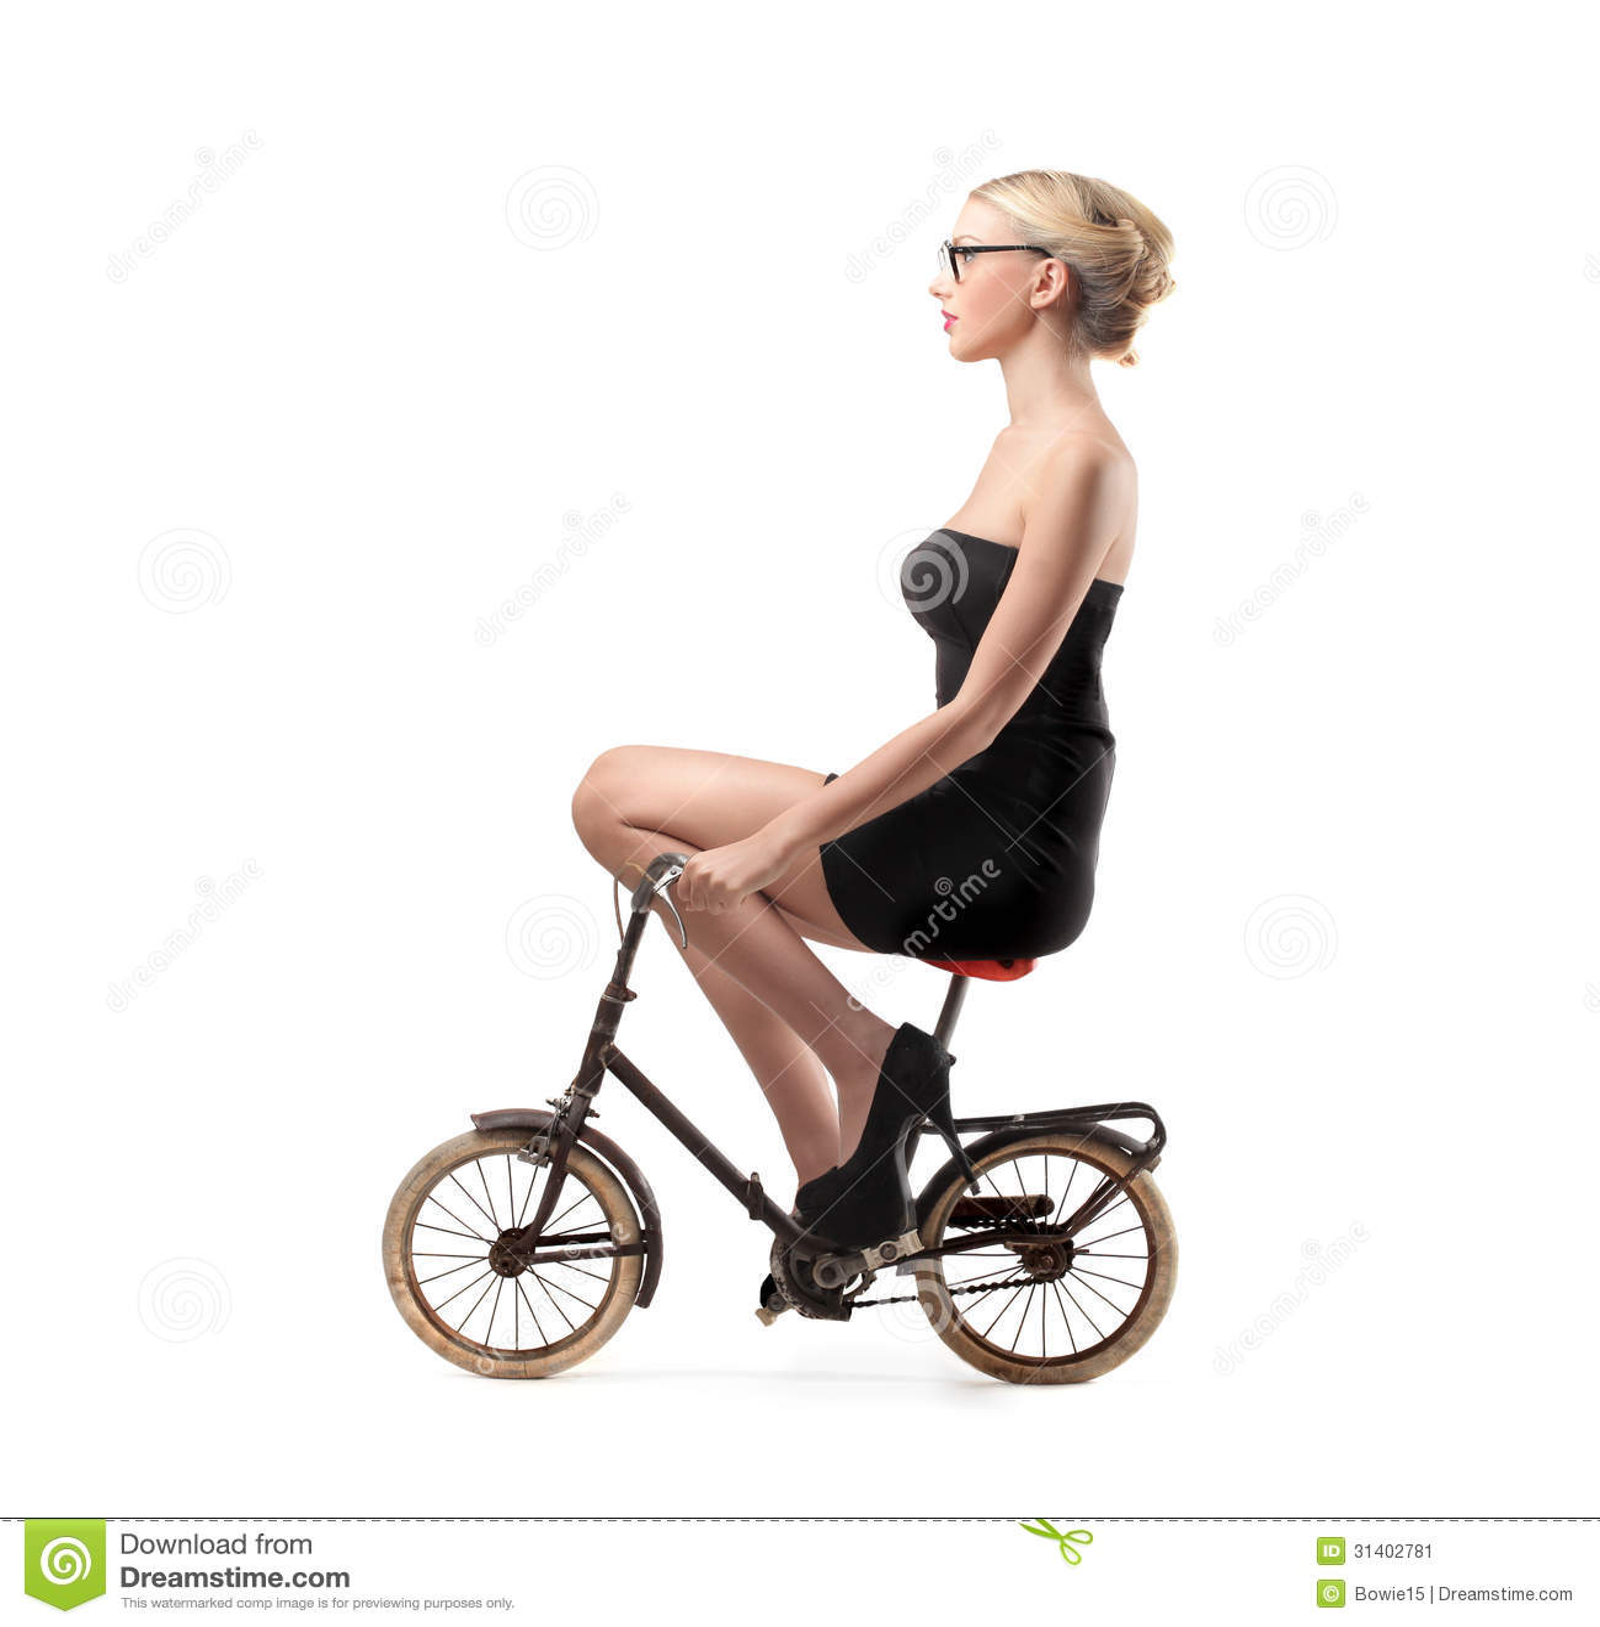 bike fahrrad bici bicicleta riding